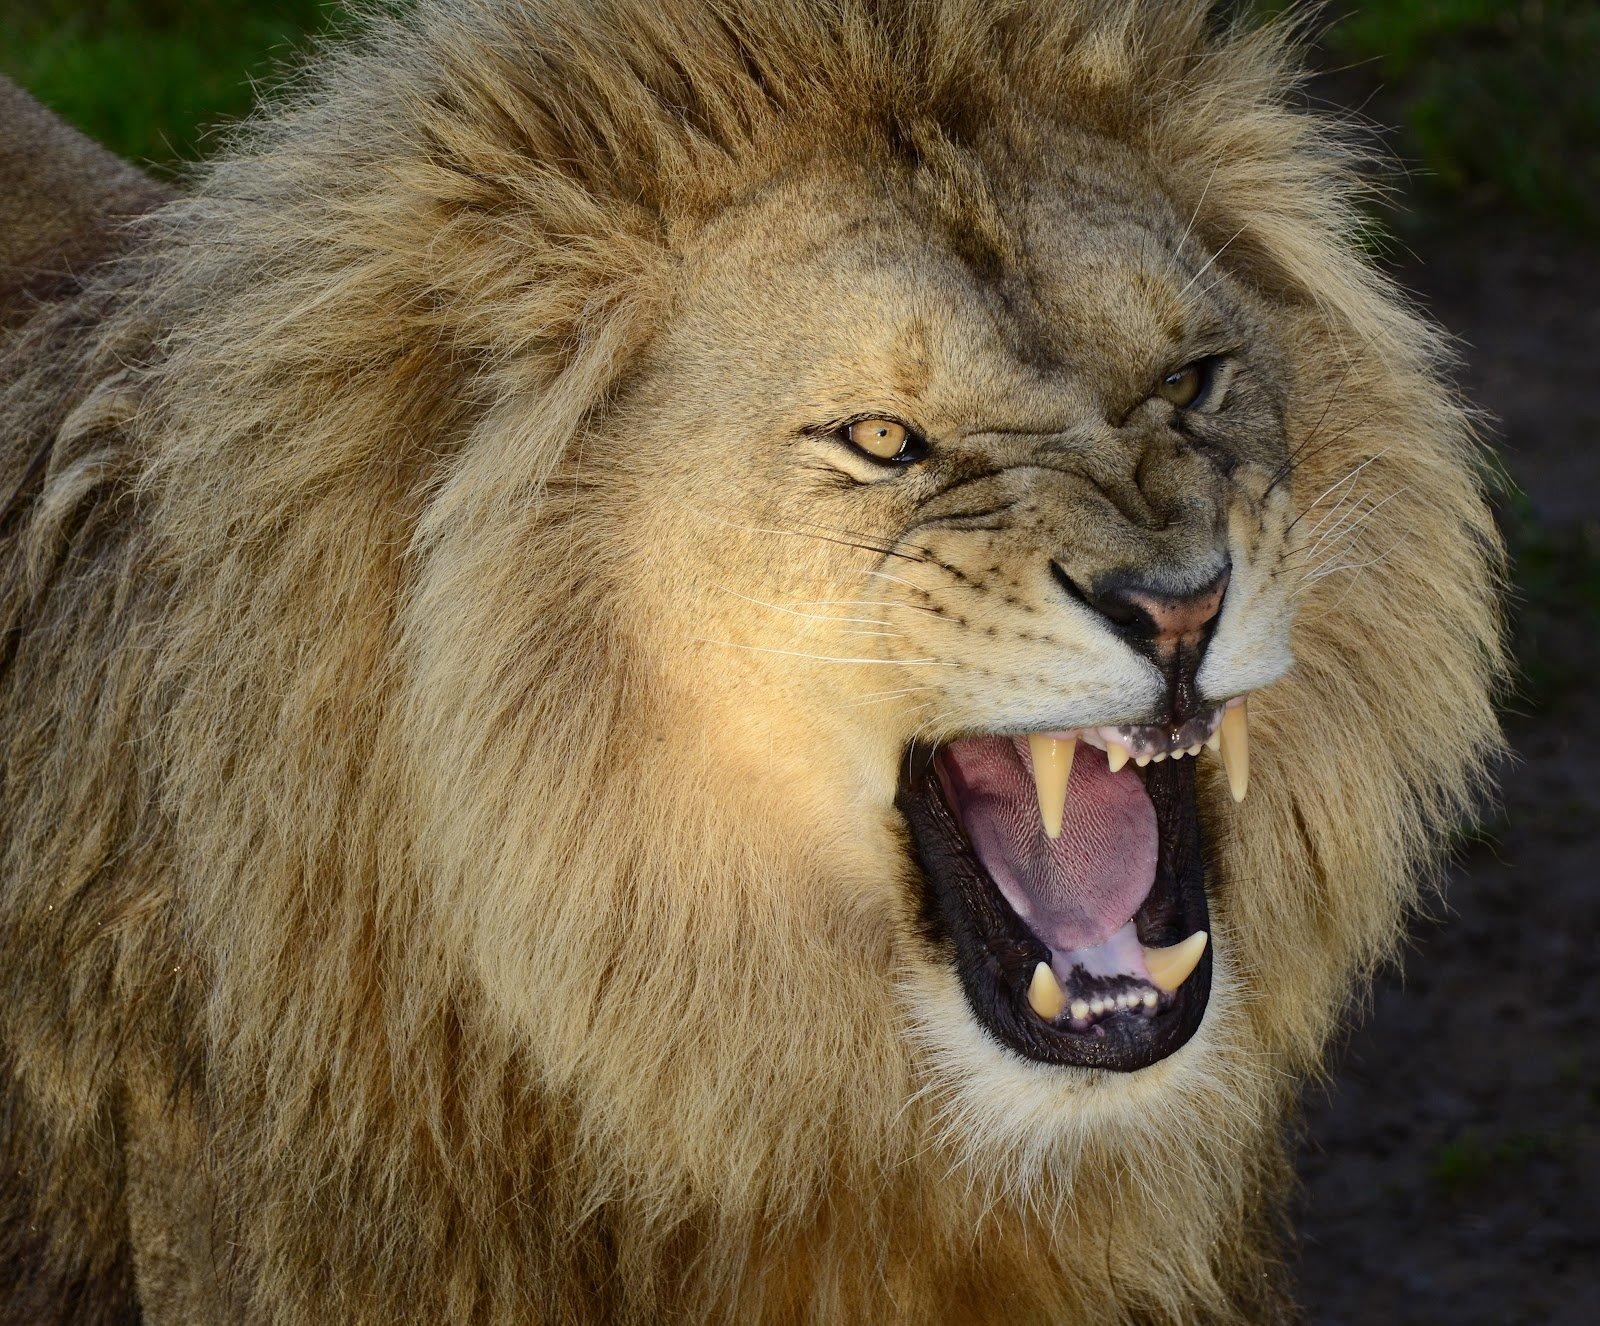 Lion Roar Wallpaper - WallpaperSafari - photo#38